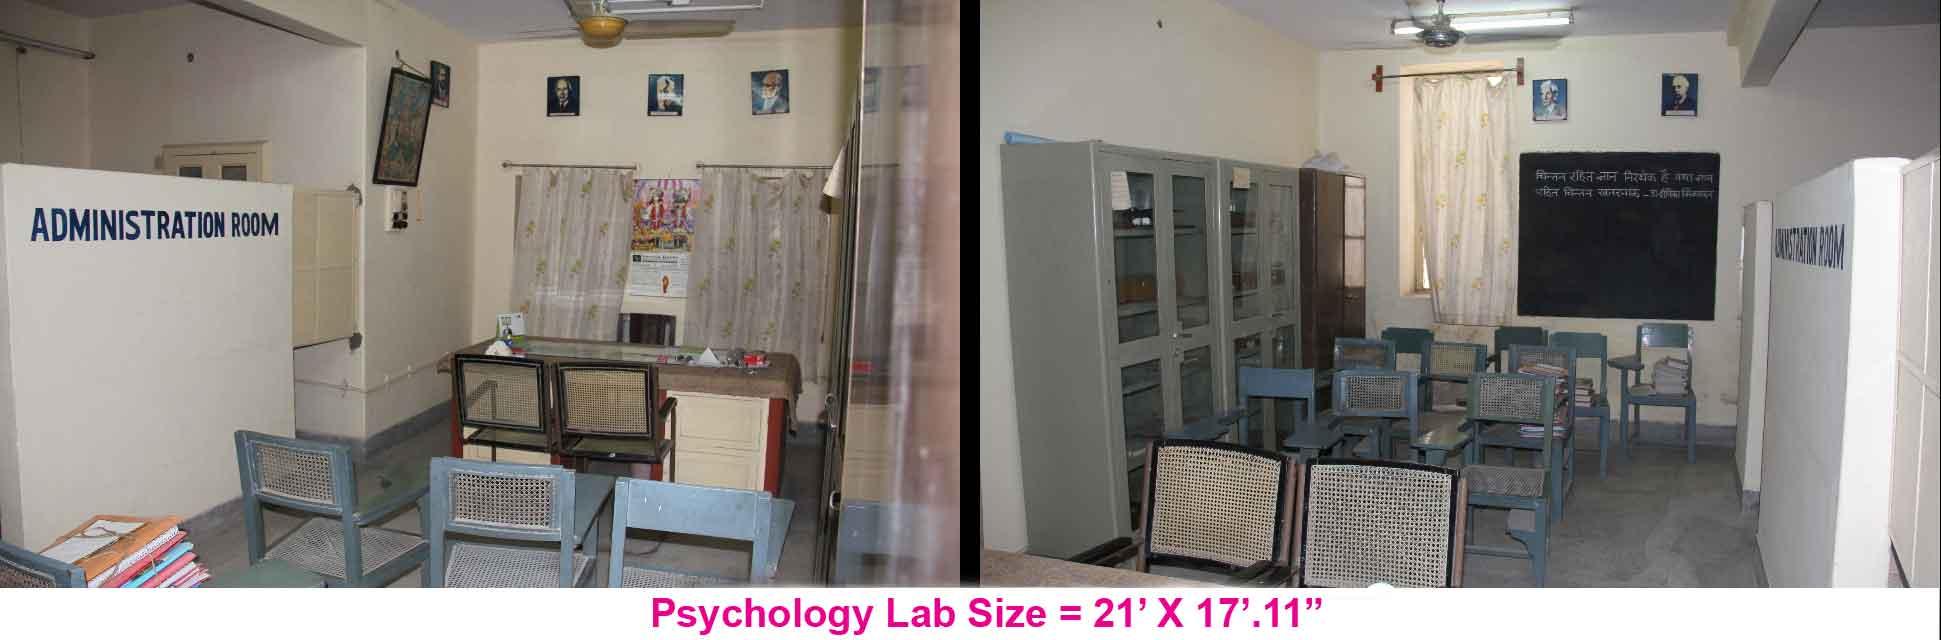 Psychology Lab